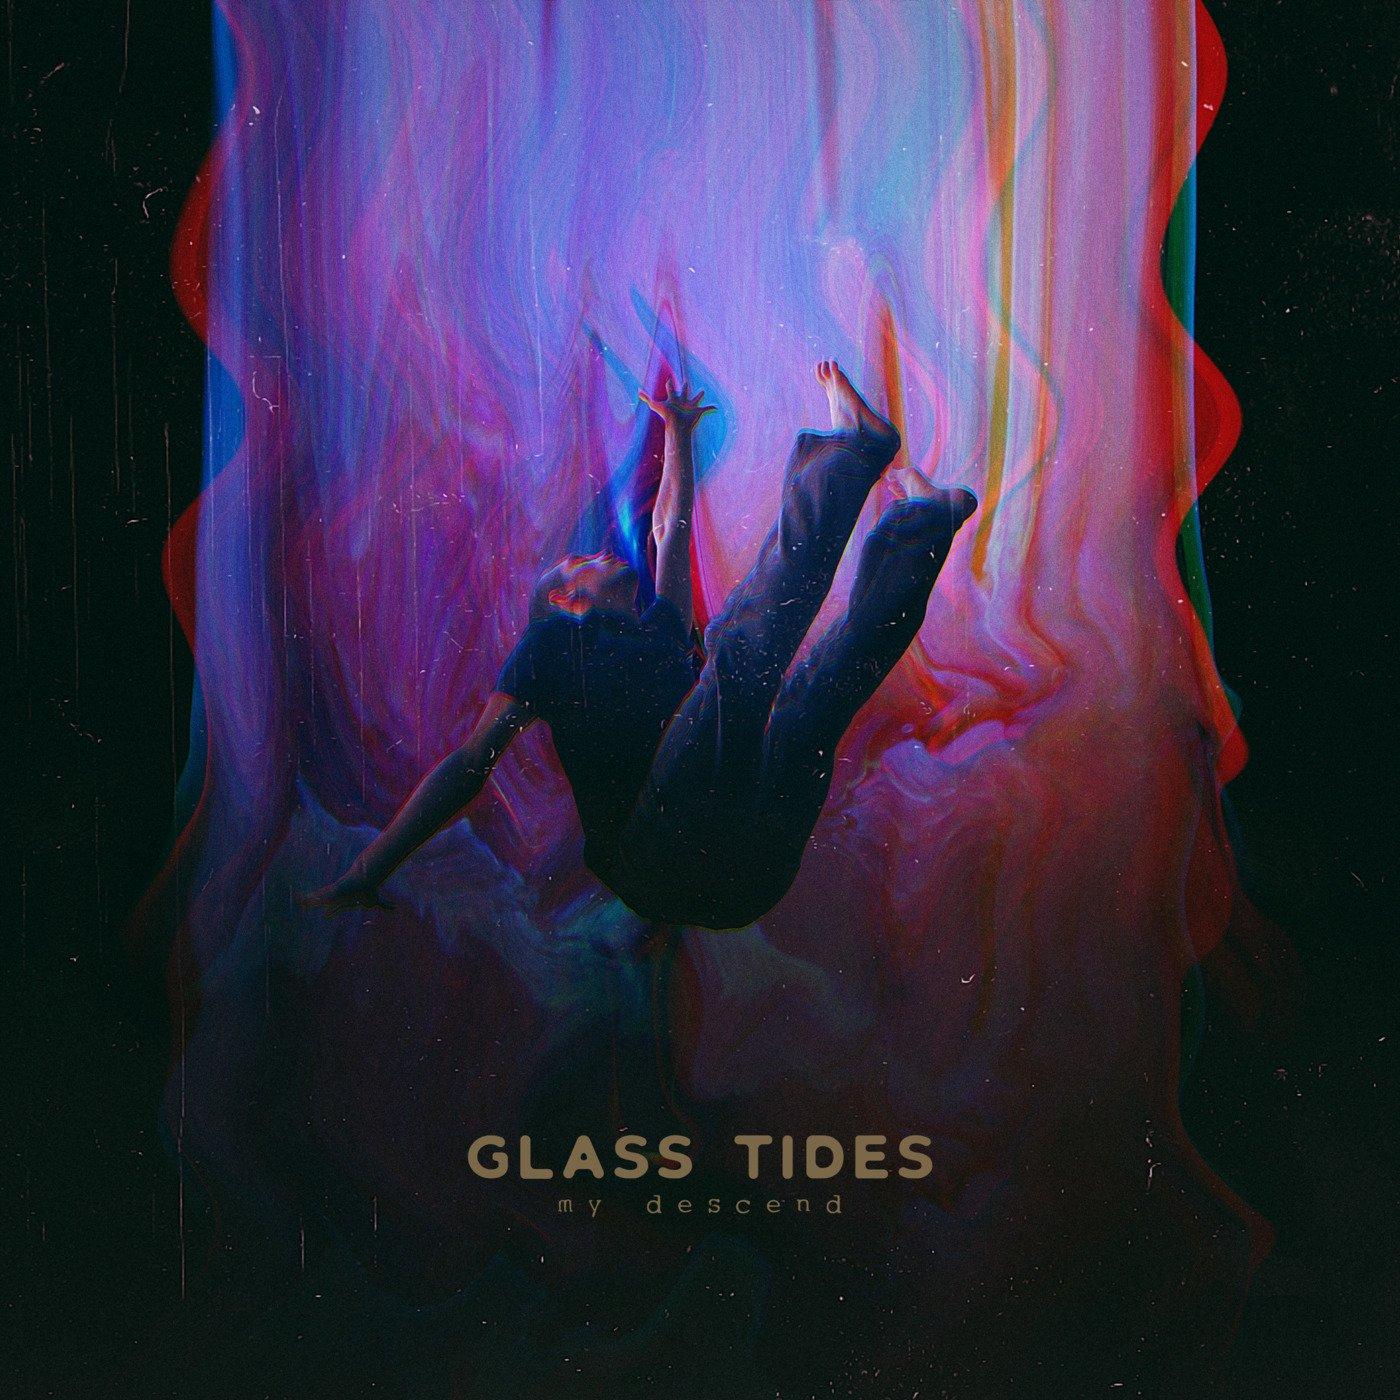 Glass Tides - My Descend [EP] (2018)